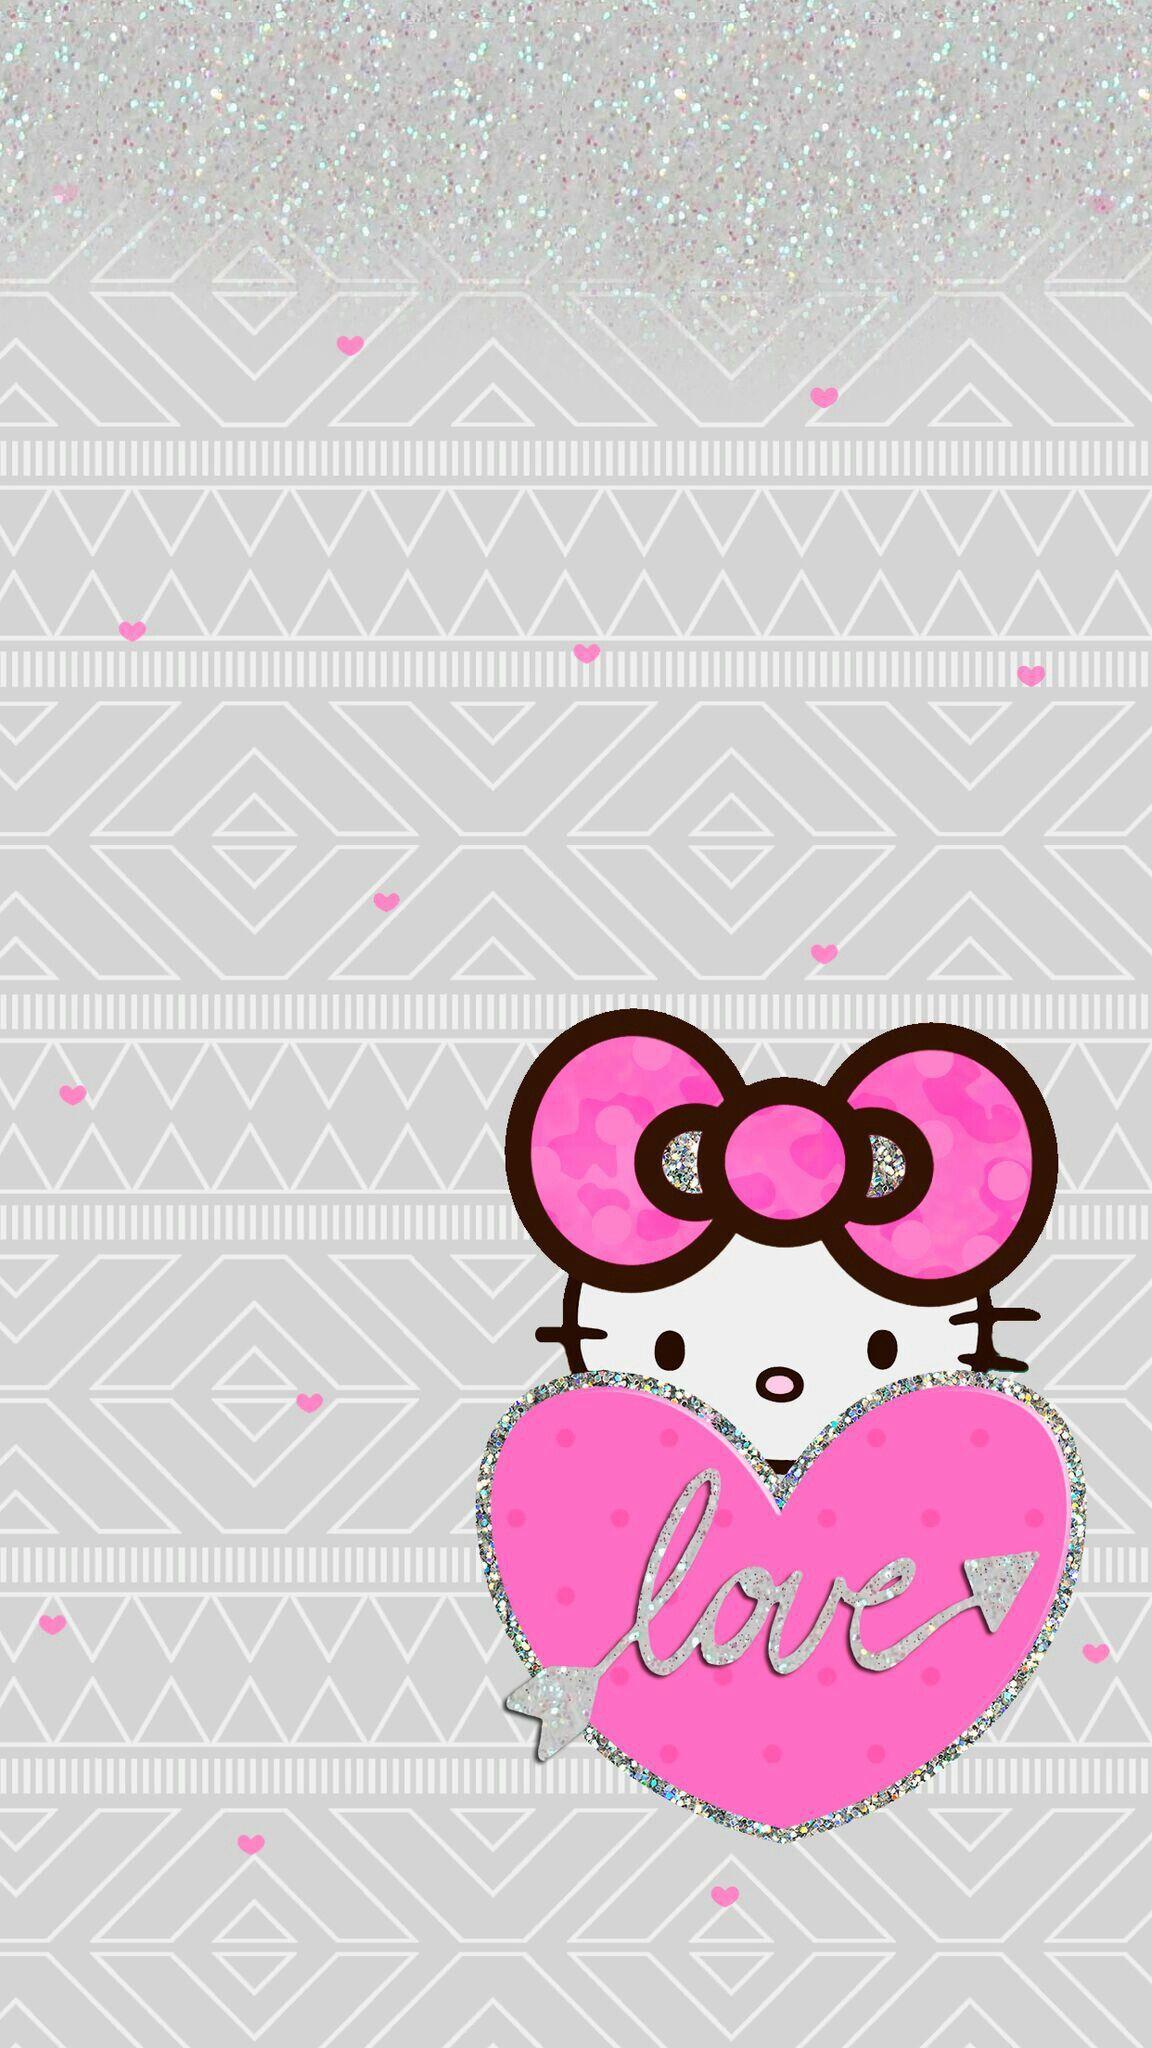 Cool Wallpaper Hello Kitty Gray - dd8e3a1a0911871f4a0d3de9102a5863  Best Photo Reference_346528.jpg